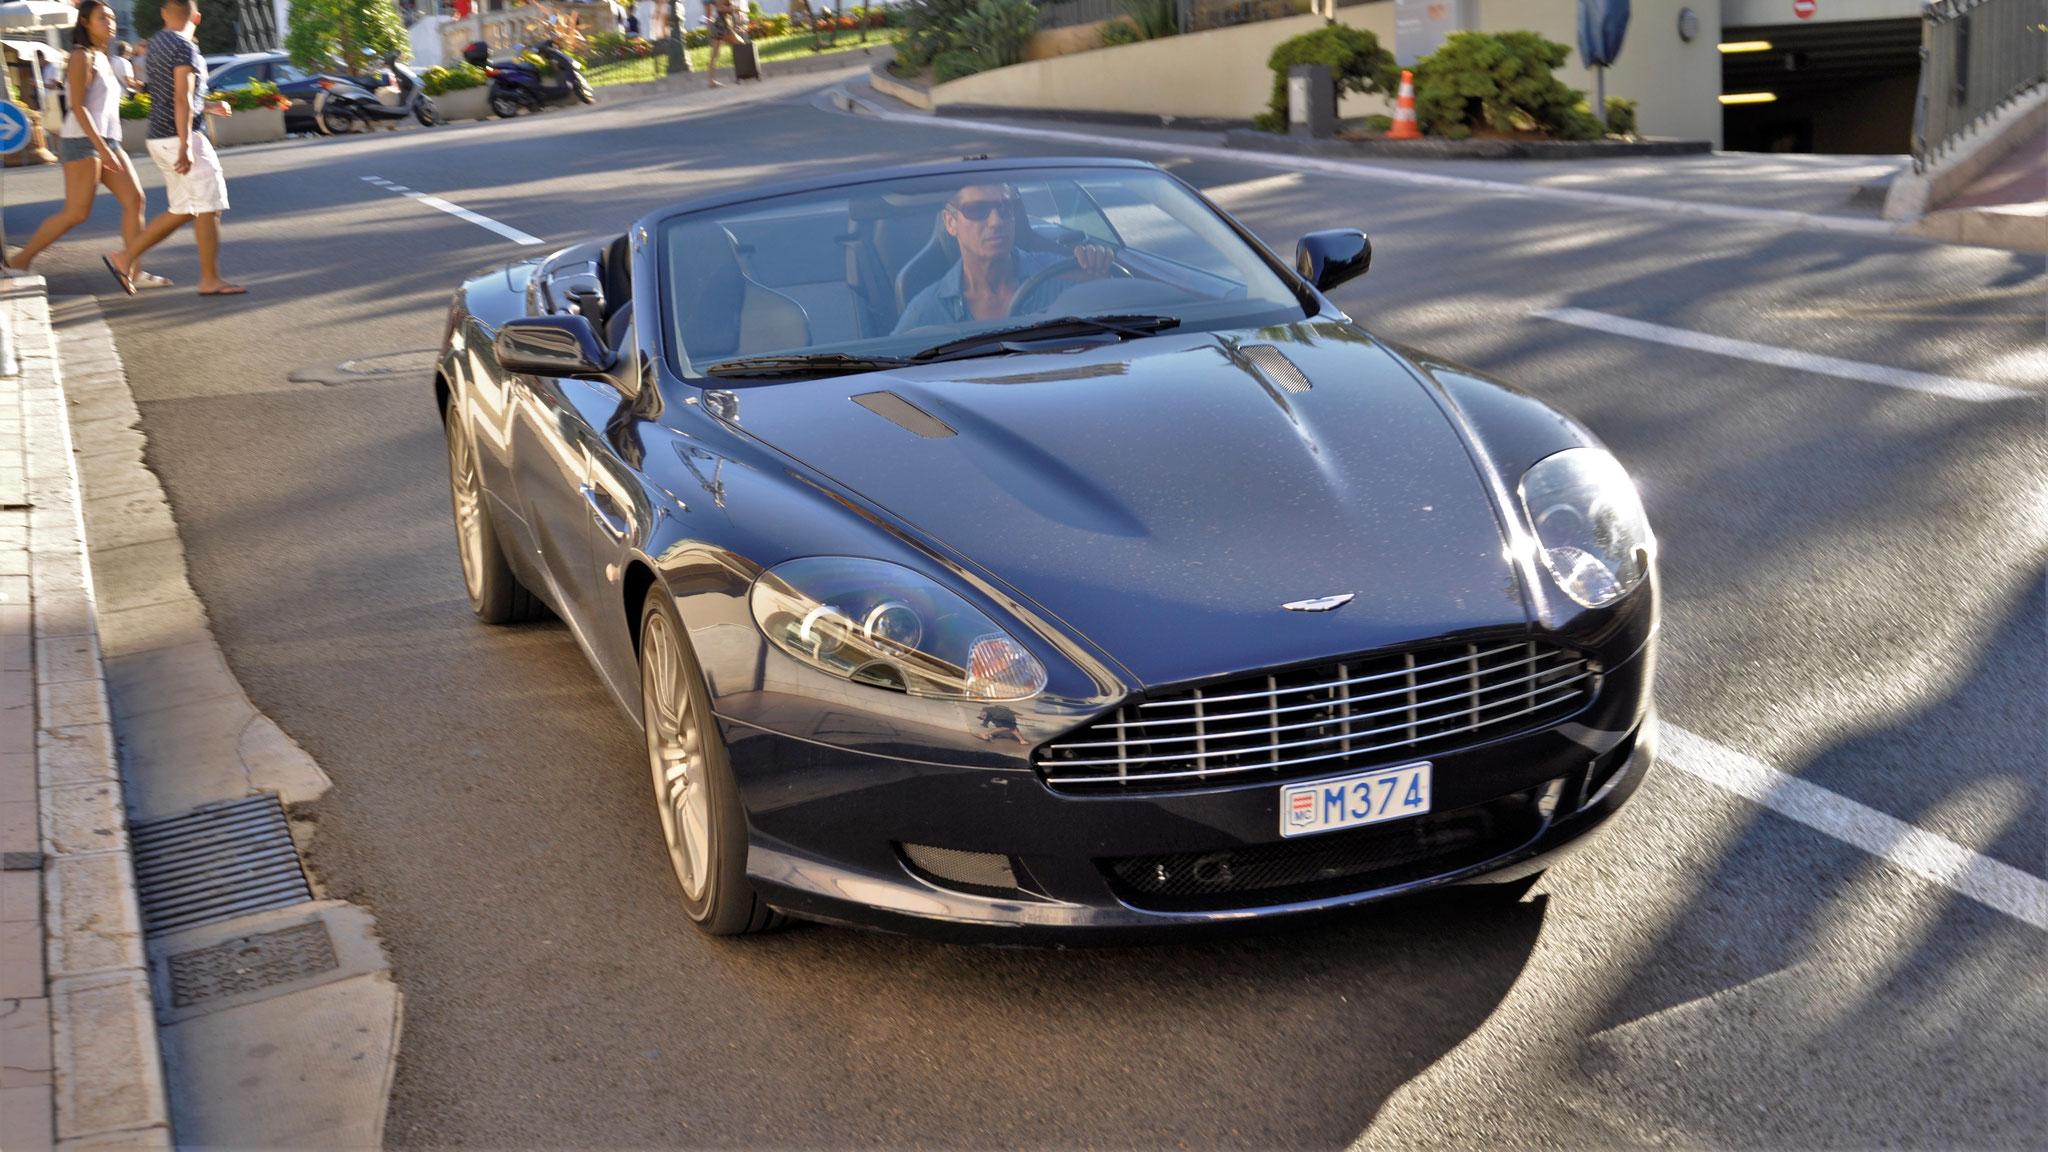 Aston Martin DB9 Volante - M374 (MC)